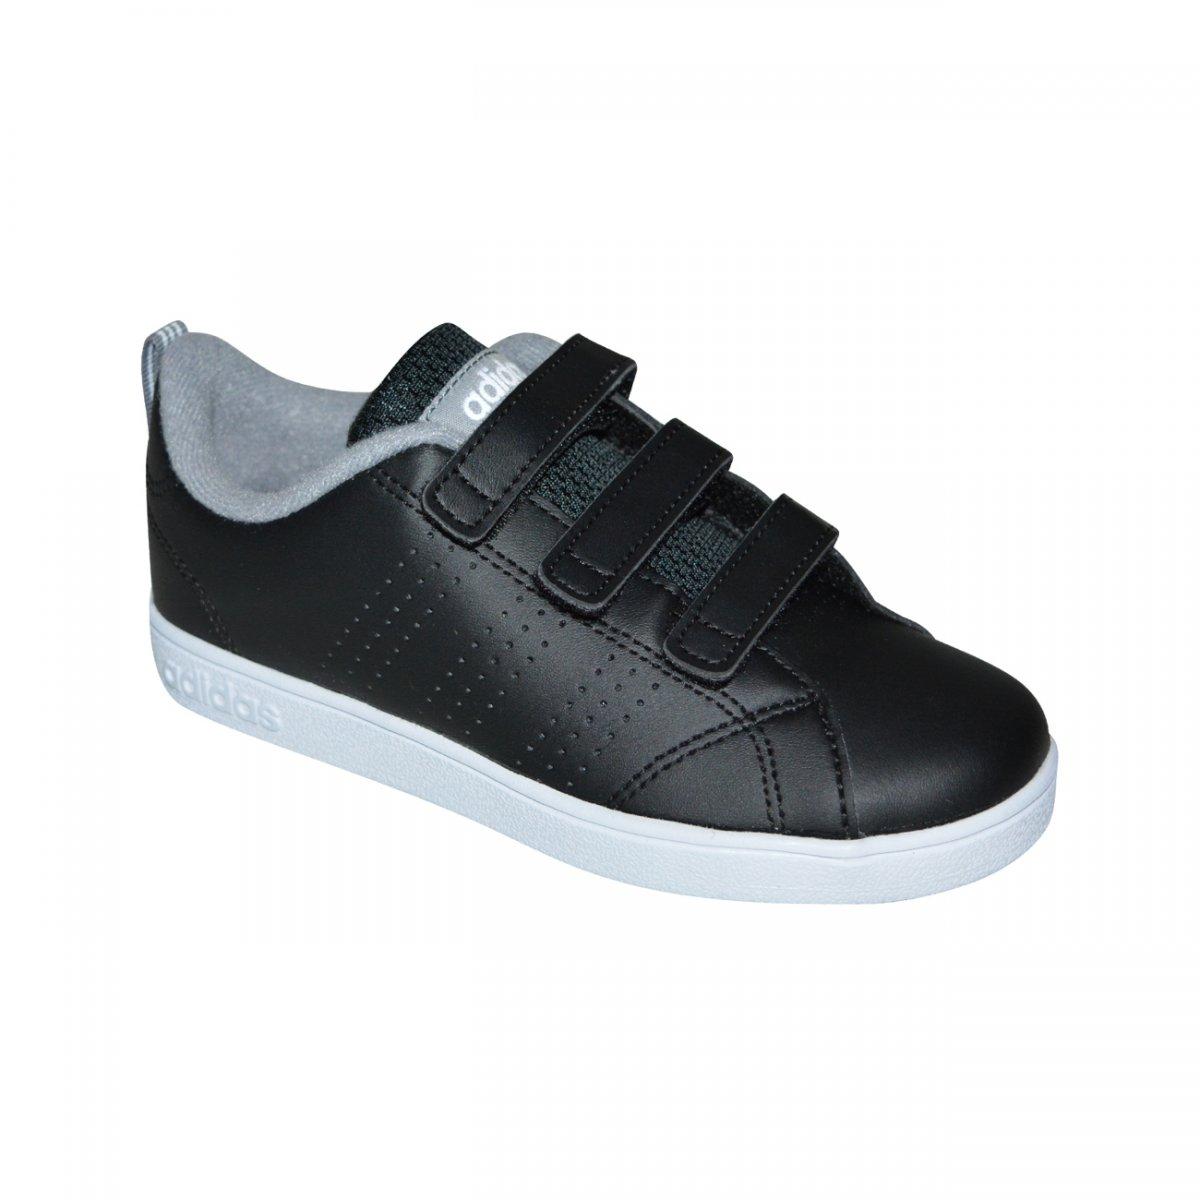 f4db8fd1e1 Tenis Adidas VS Advantage Clean CMF C Infantil DB1822 - Preto cinza branco  - Chuteira Nike